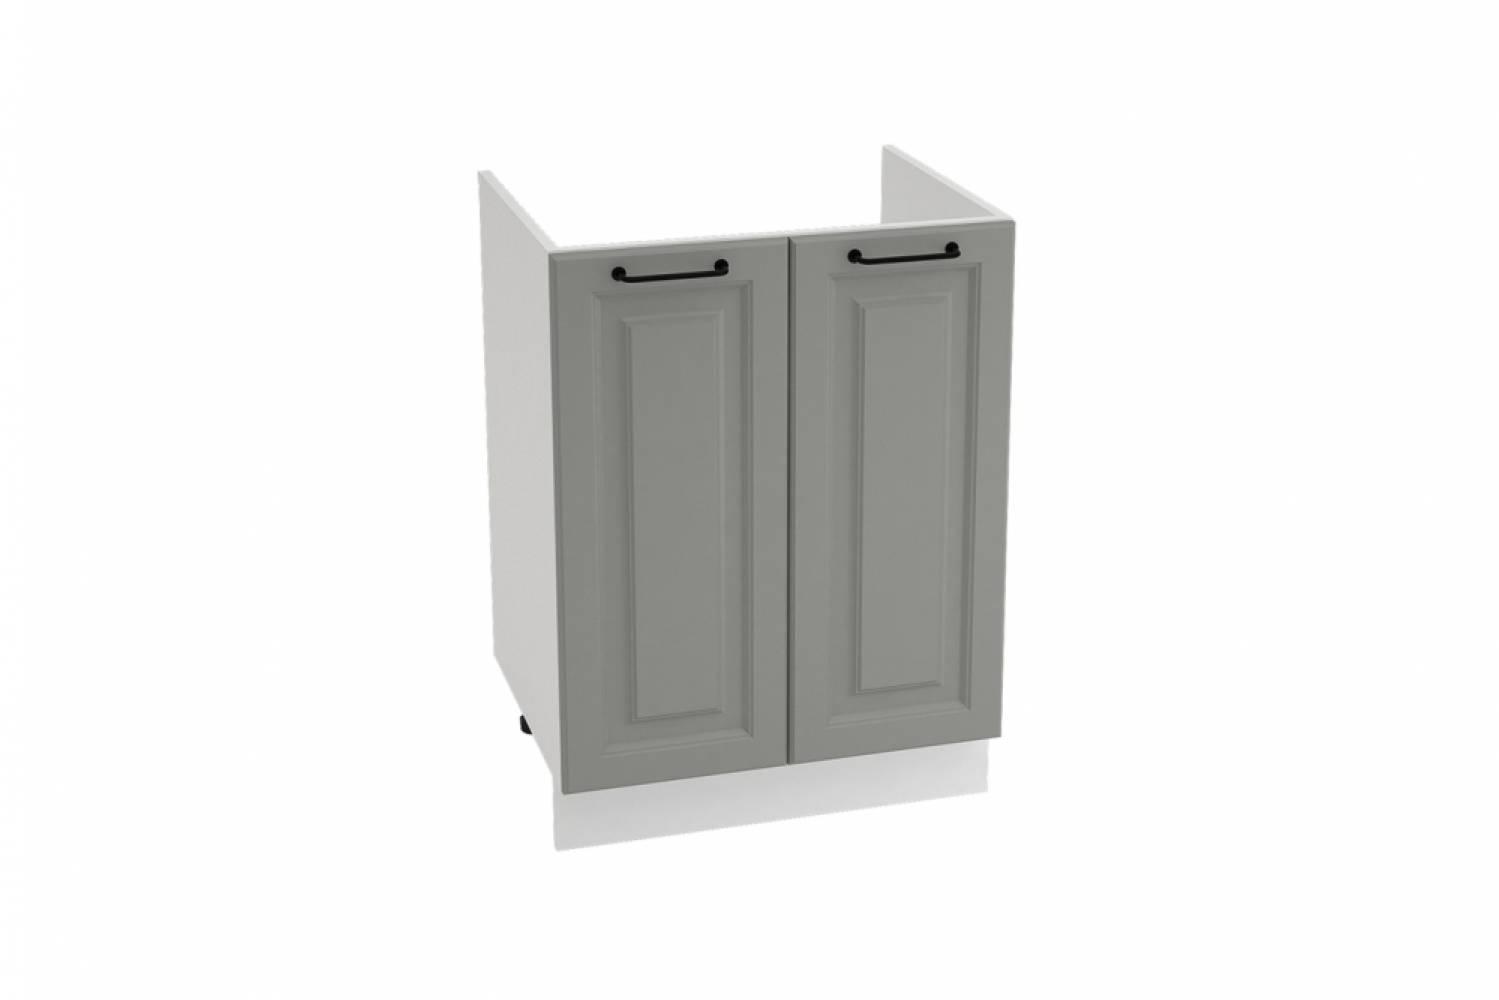 Шкаф нижний под мойку ШНМ 600 НИЦЦА ROYAL (MAGNUM) 600 мм